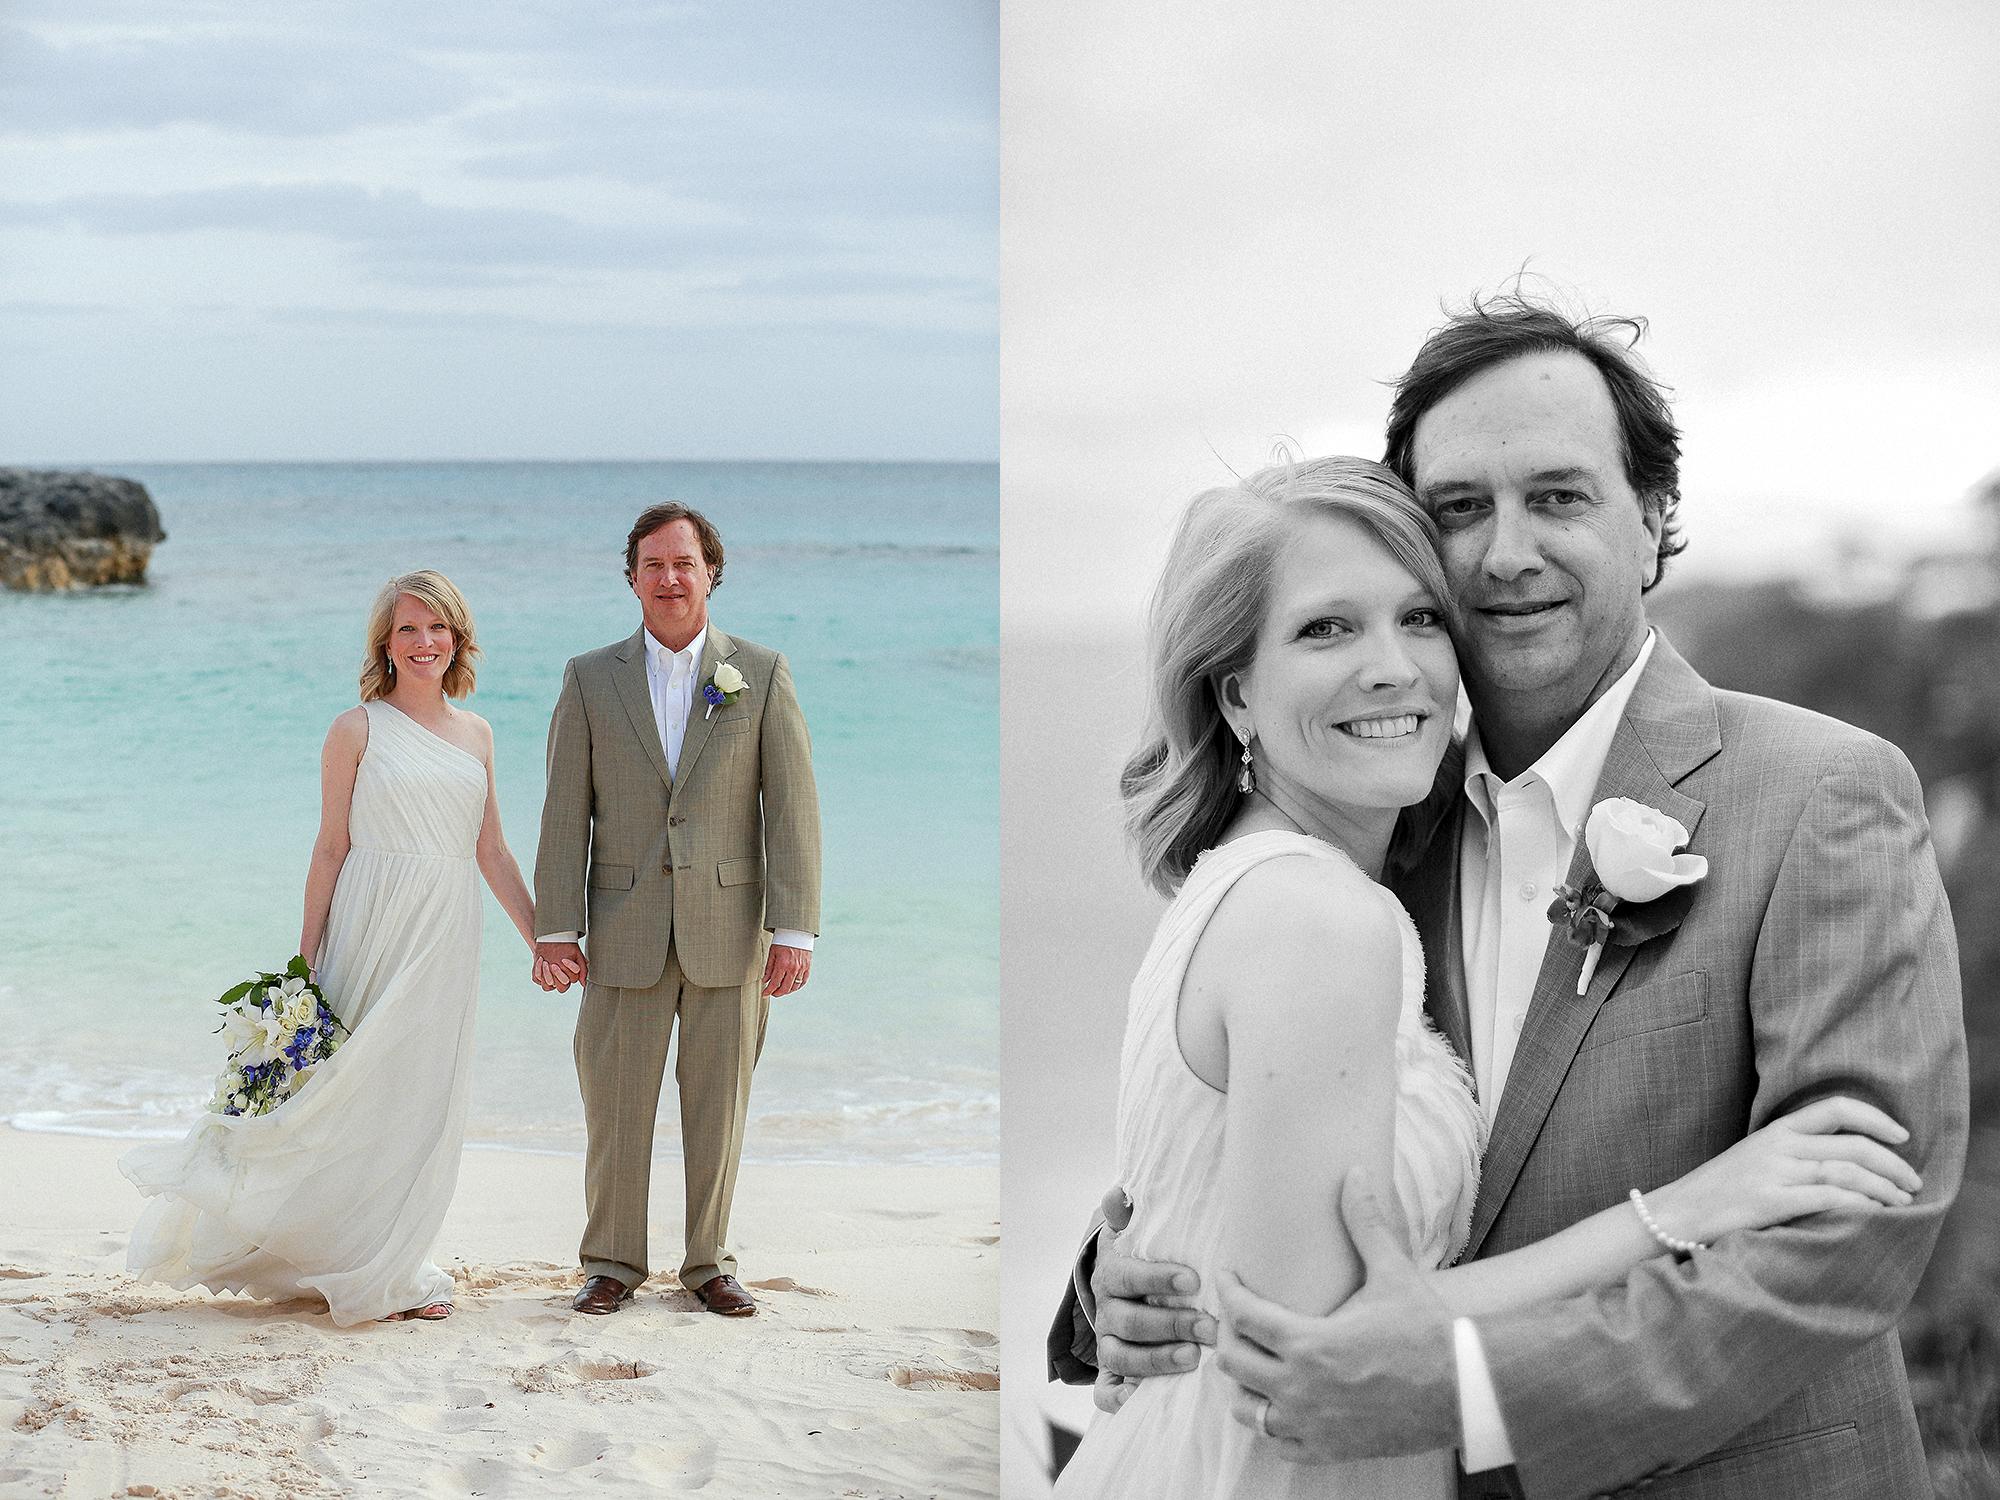 bermuda wedding photography beach island destination bride groom photographer 06